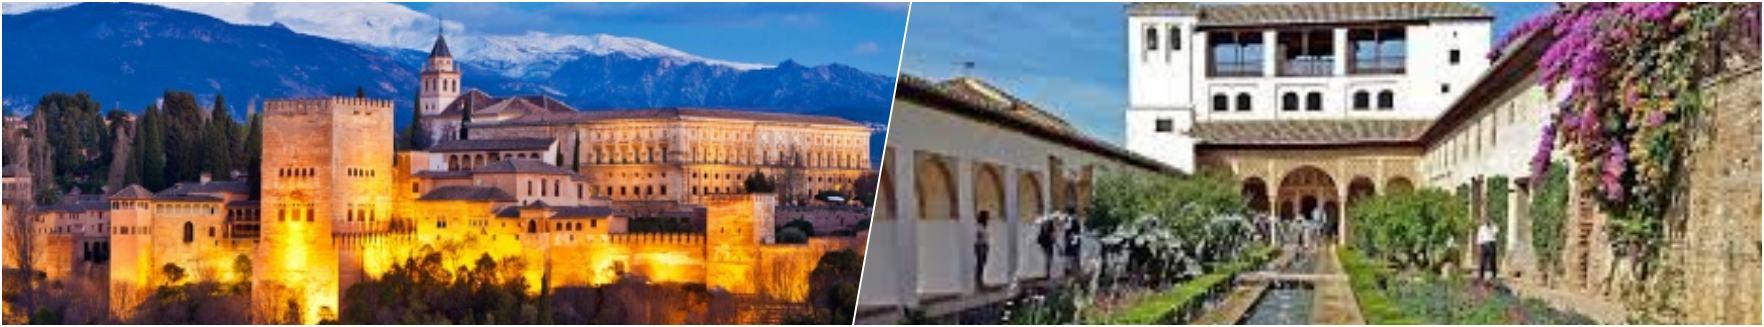 Ahlambra Palace - Generalife